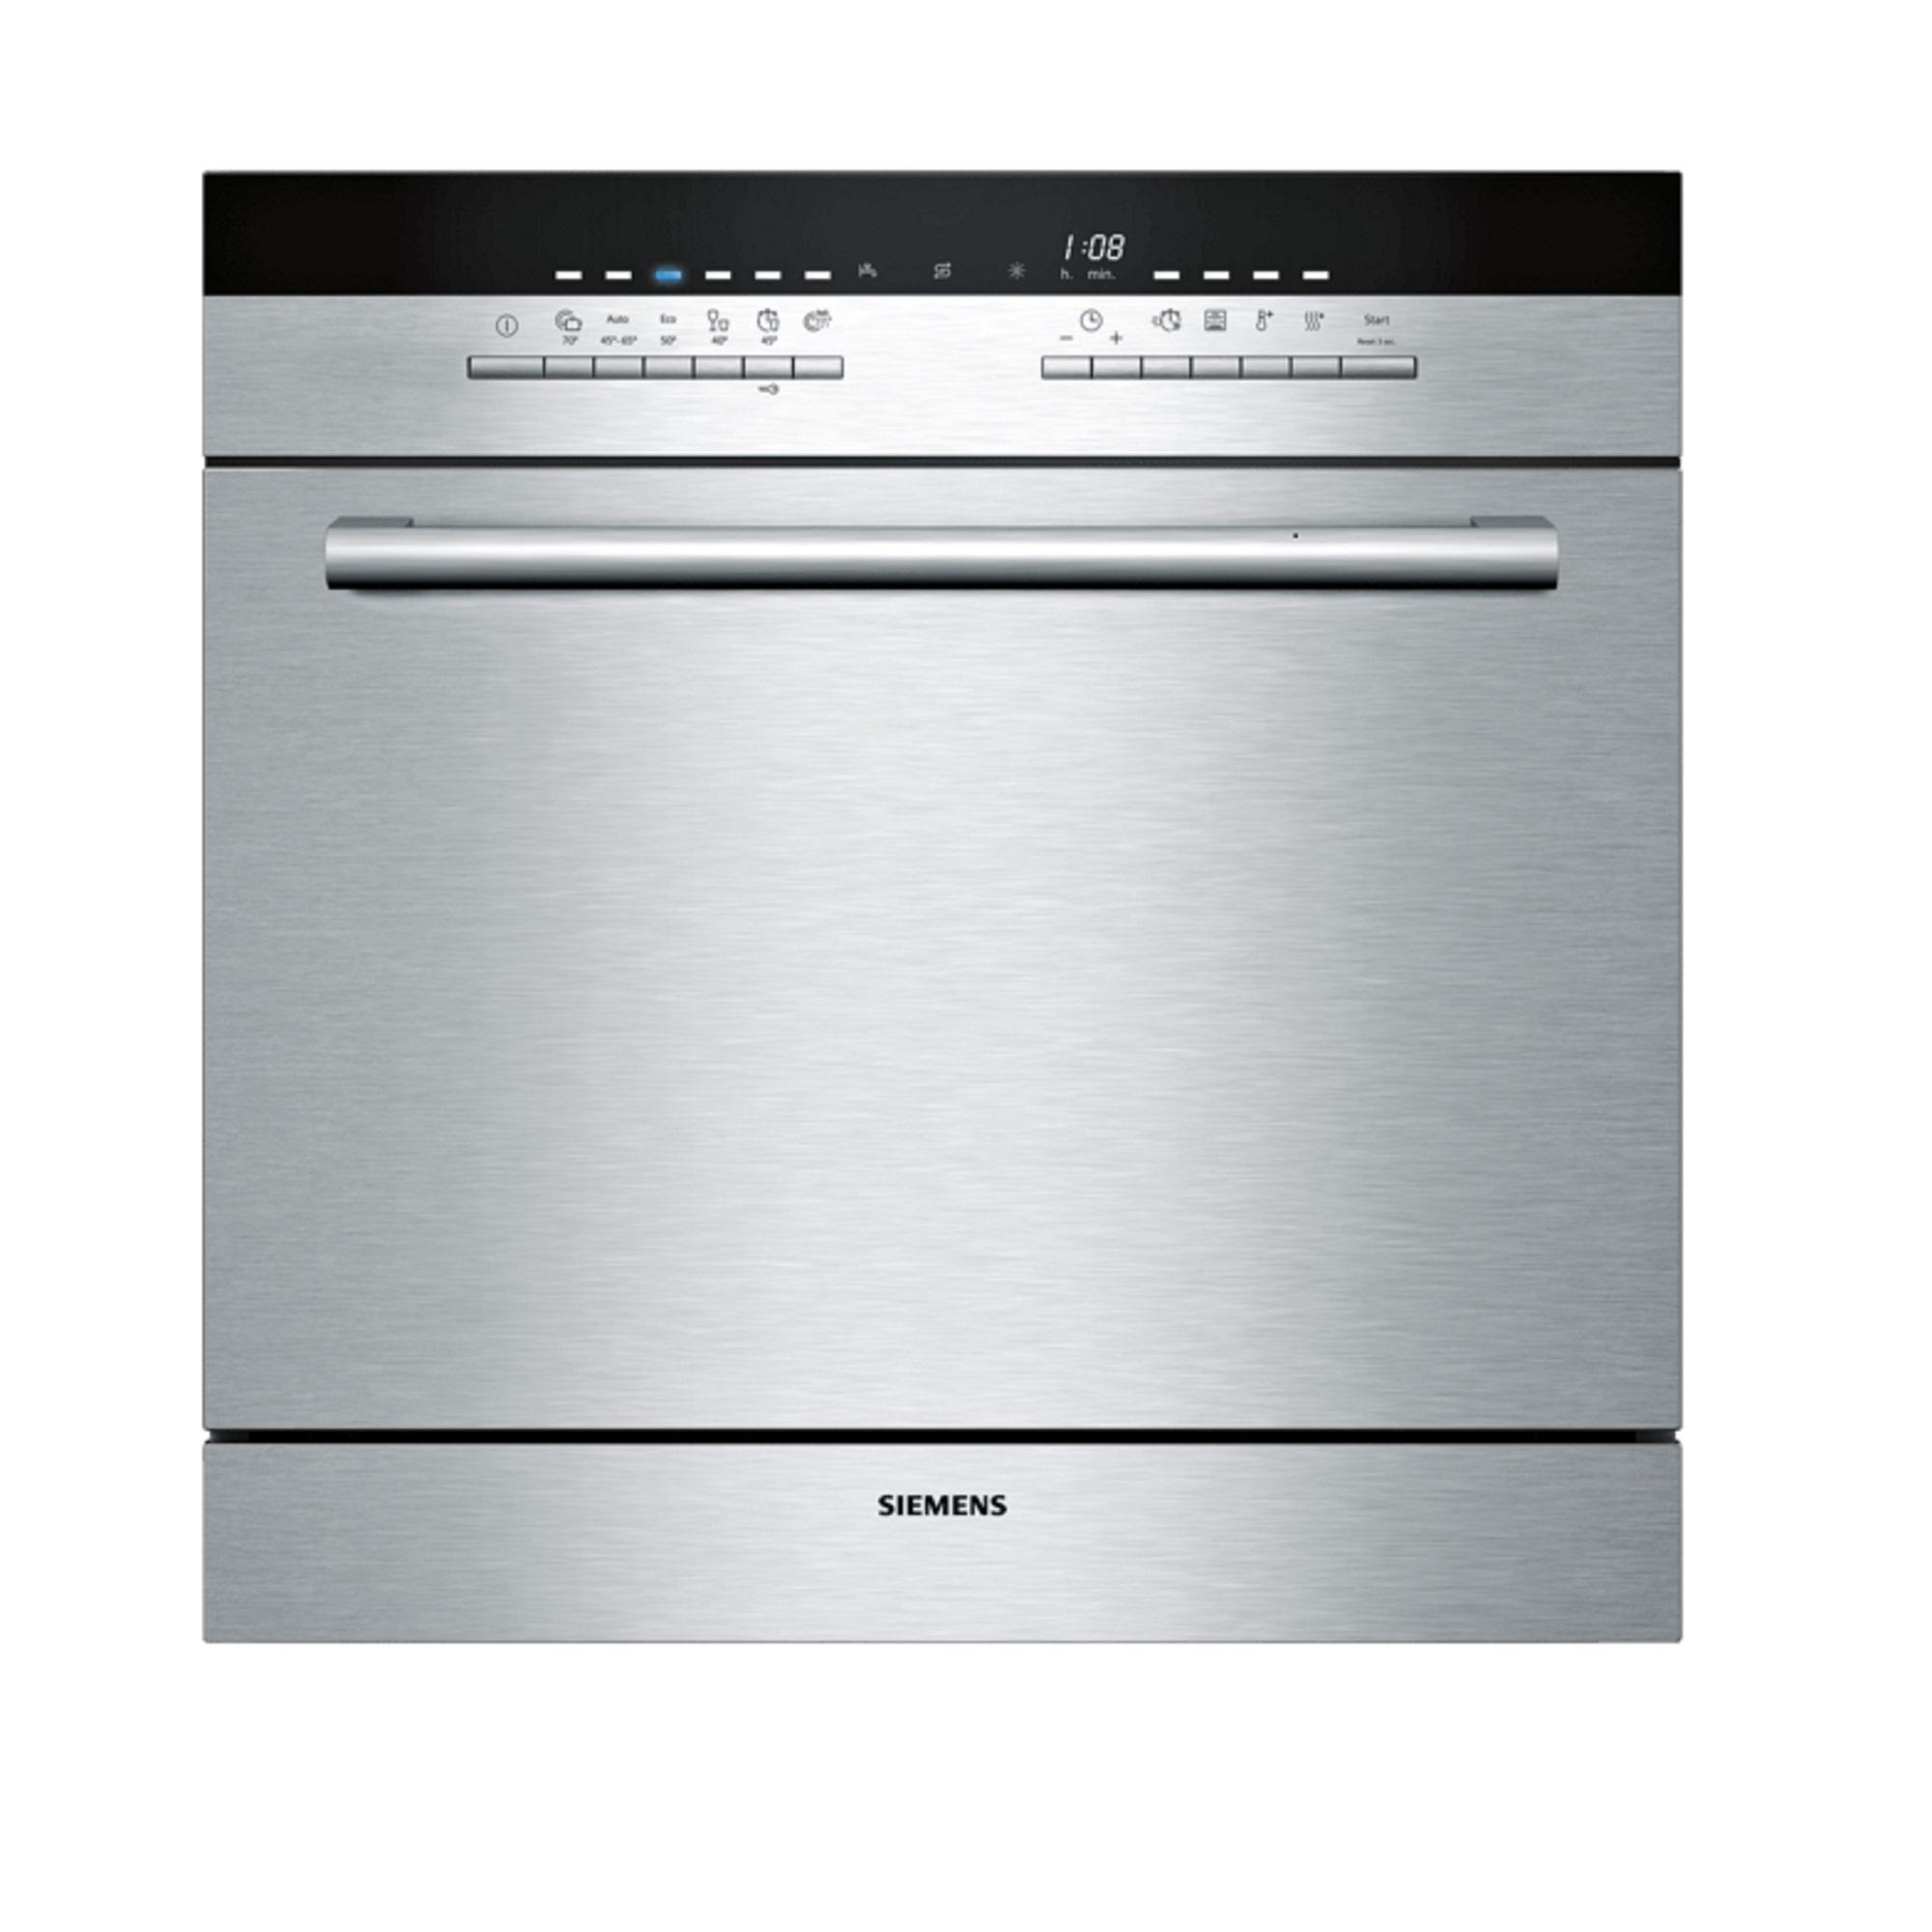 SIEMENS 洗碗機 SC76M542EU 需訂貨